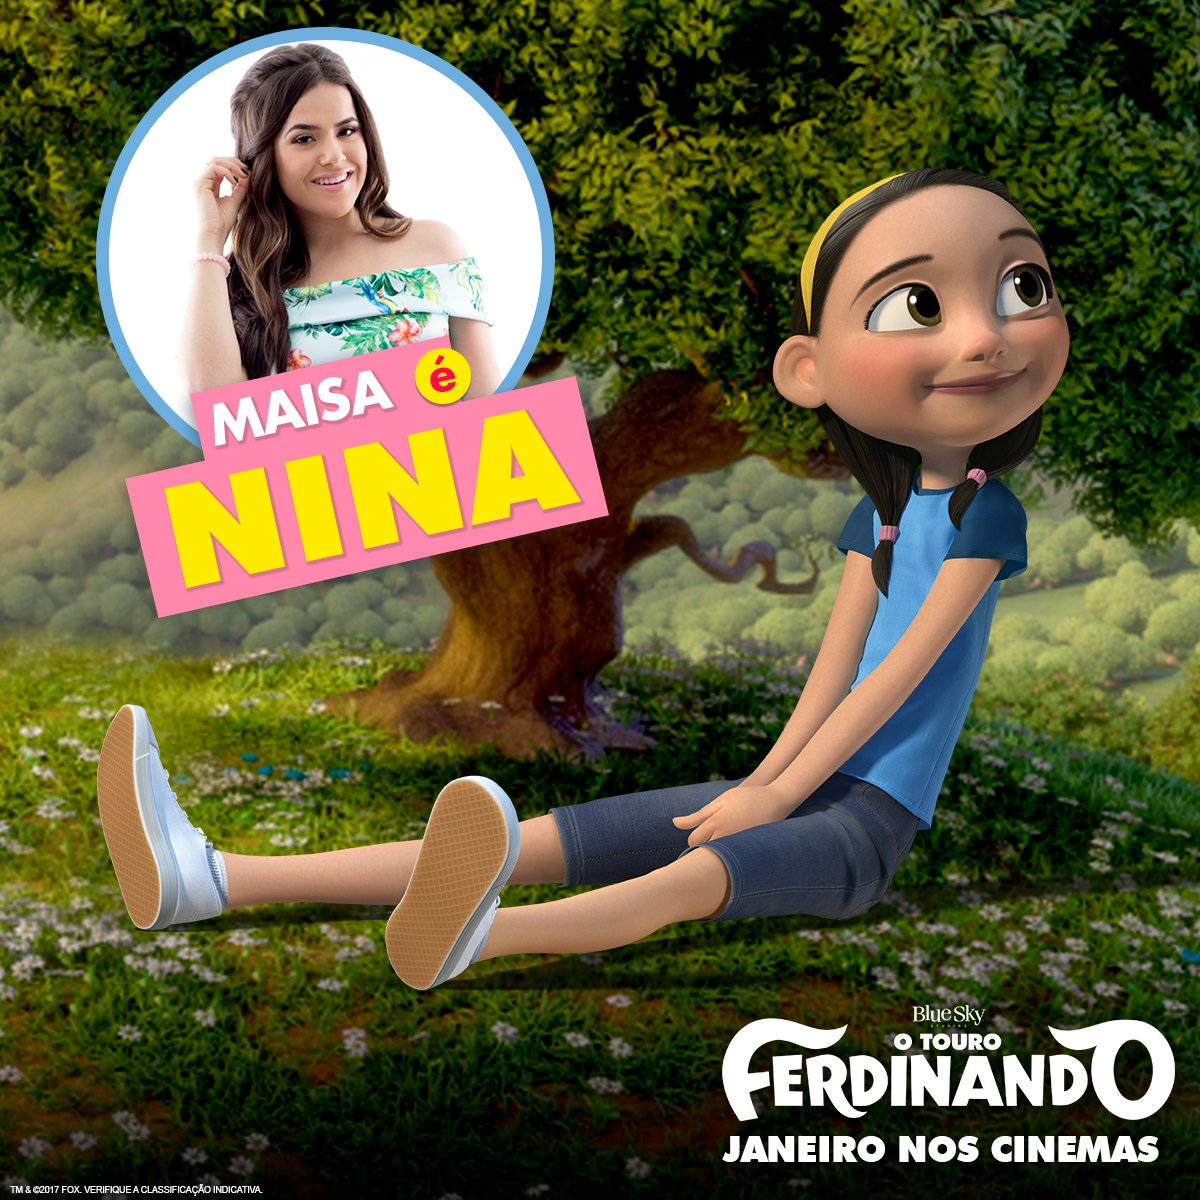 Maisa voz da Nina versao brasileira